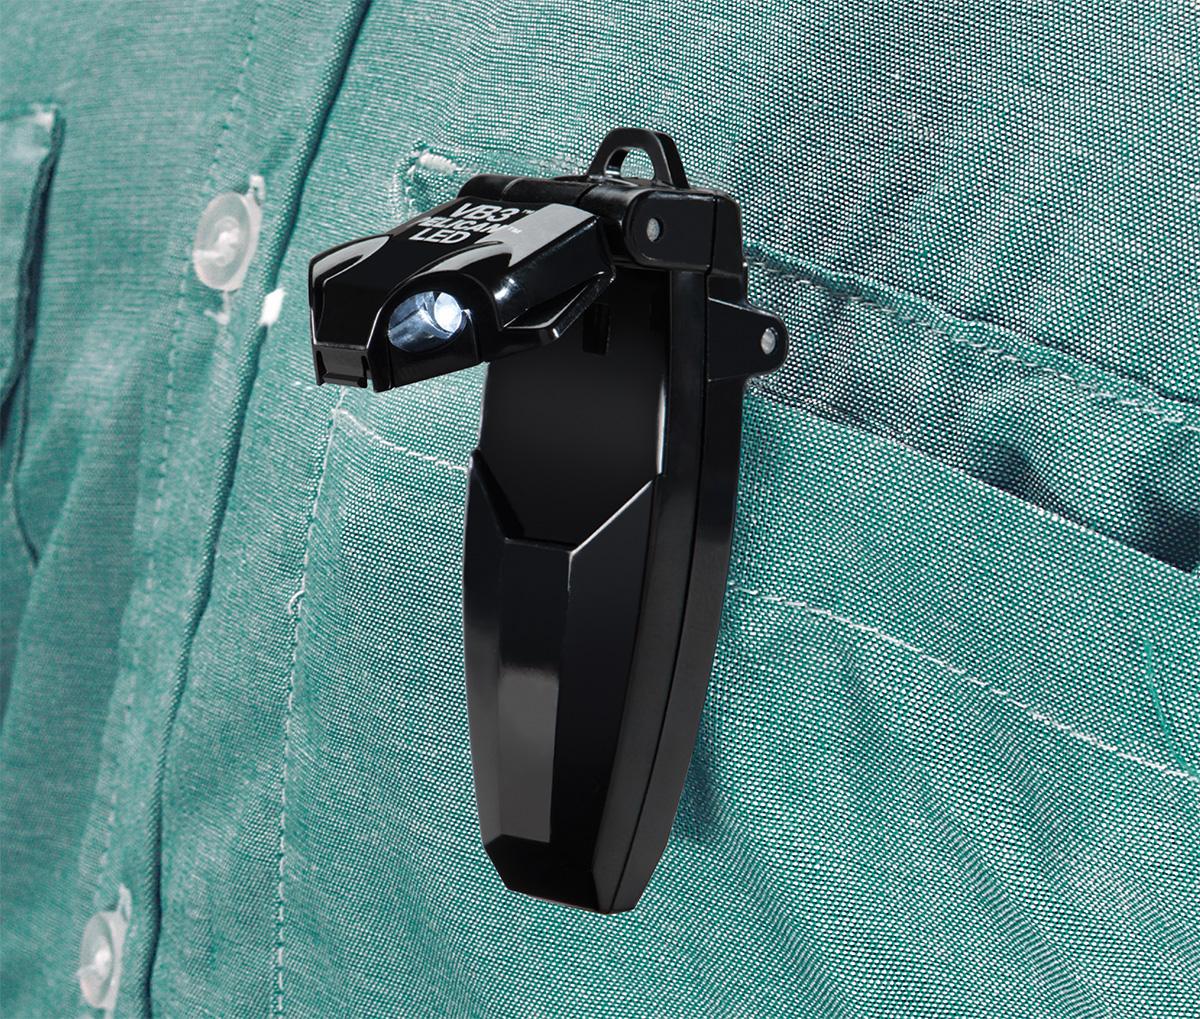 pelican peli products 2220 bright shirt pocket clip on led light